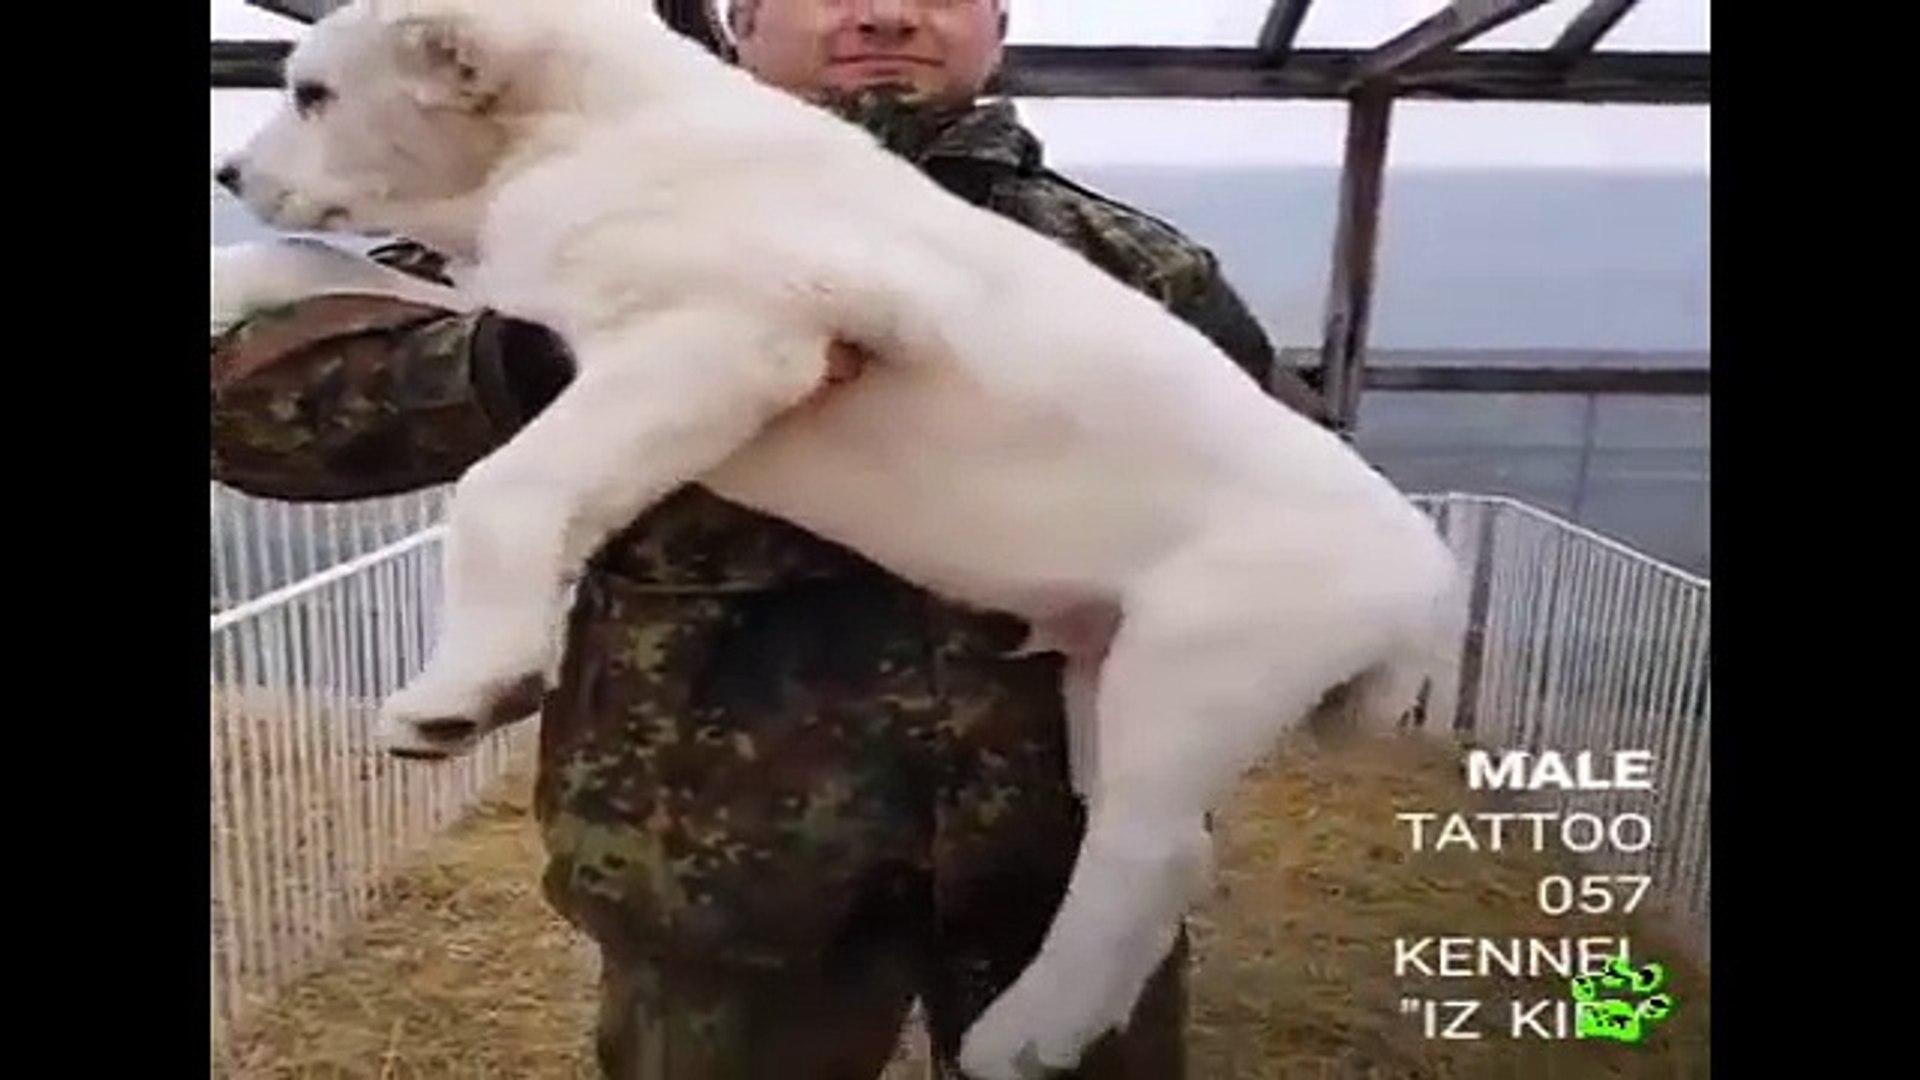 COK SEViMLi ALABAY COBAN KOPEGi YAVRUSU - VERY CUTE ALABAI SHEPHERD DOG PUPPY